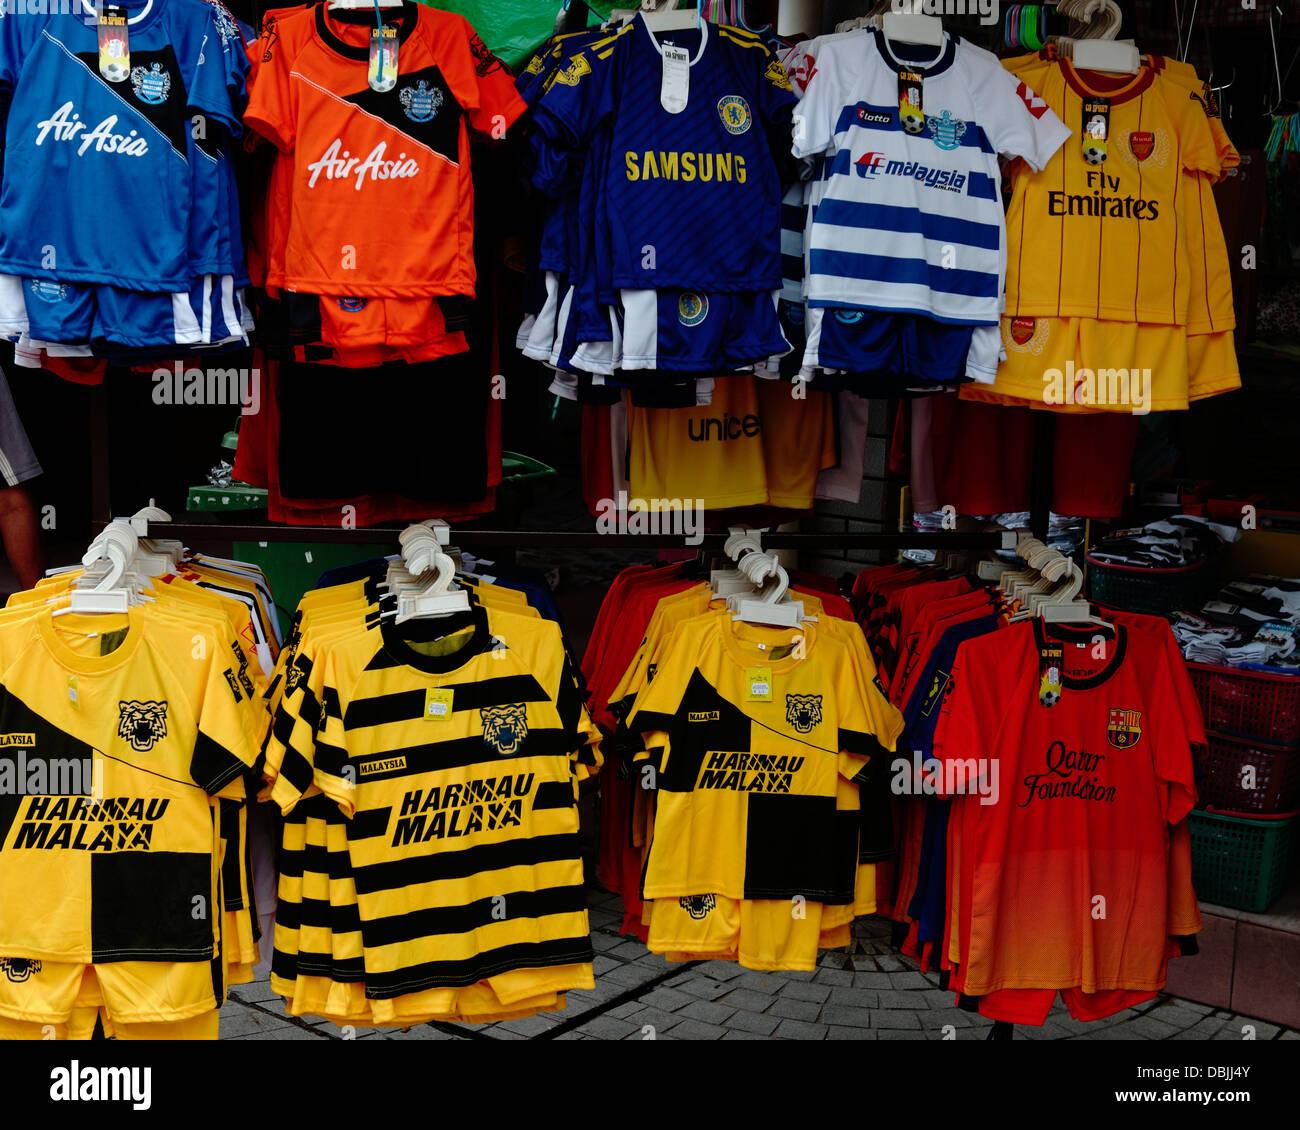 wholesale dealer fccb0 1c660 Fake Shirts Stock Photos & Fake Shirts Stock Images - Alamy